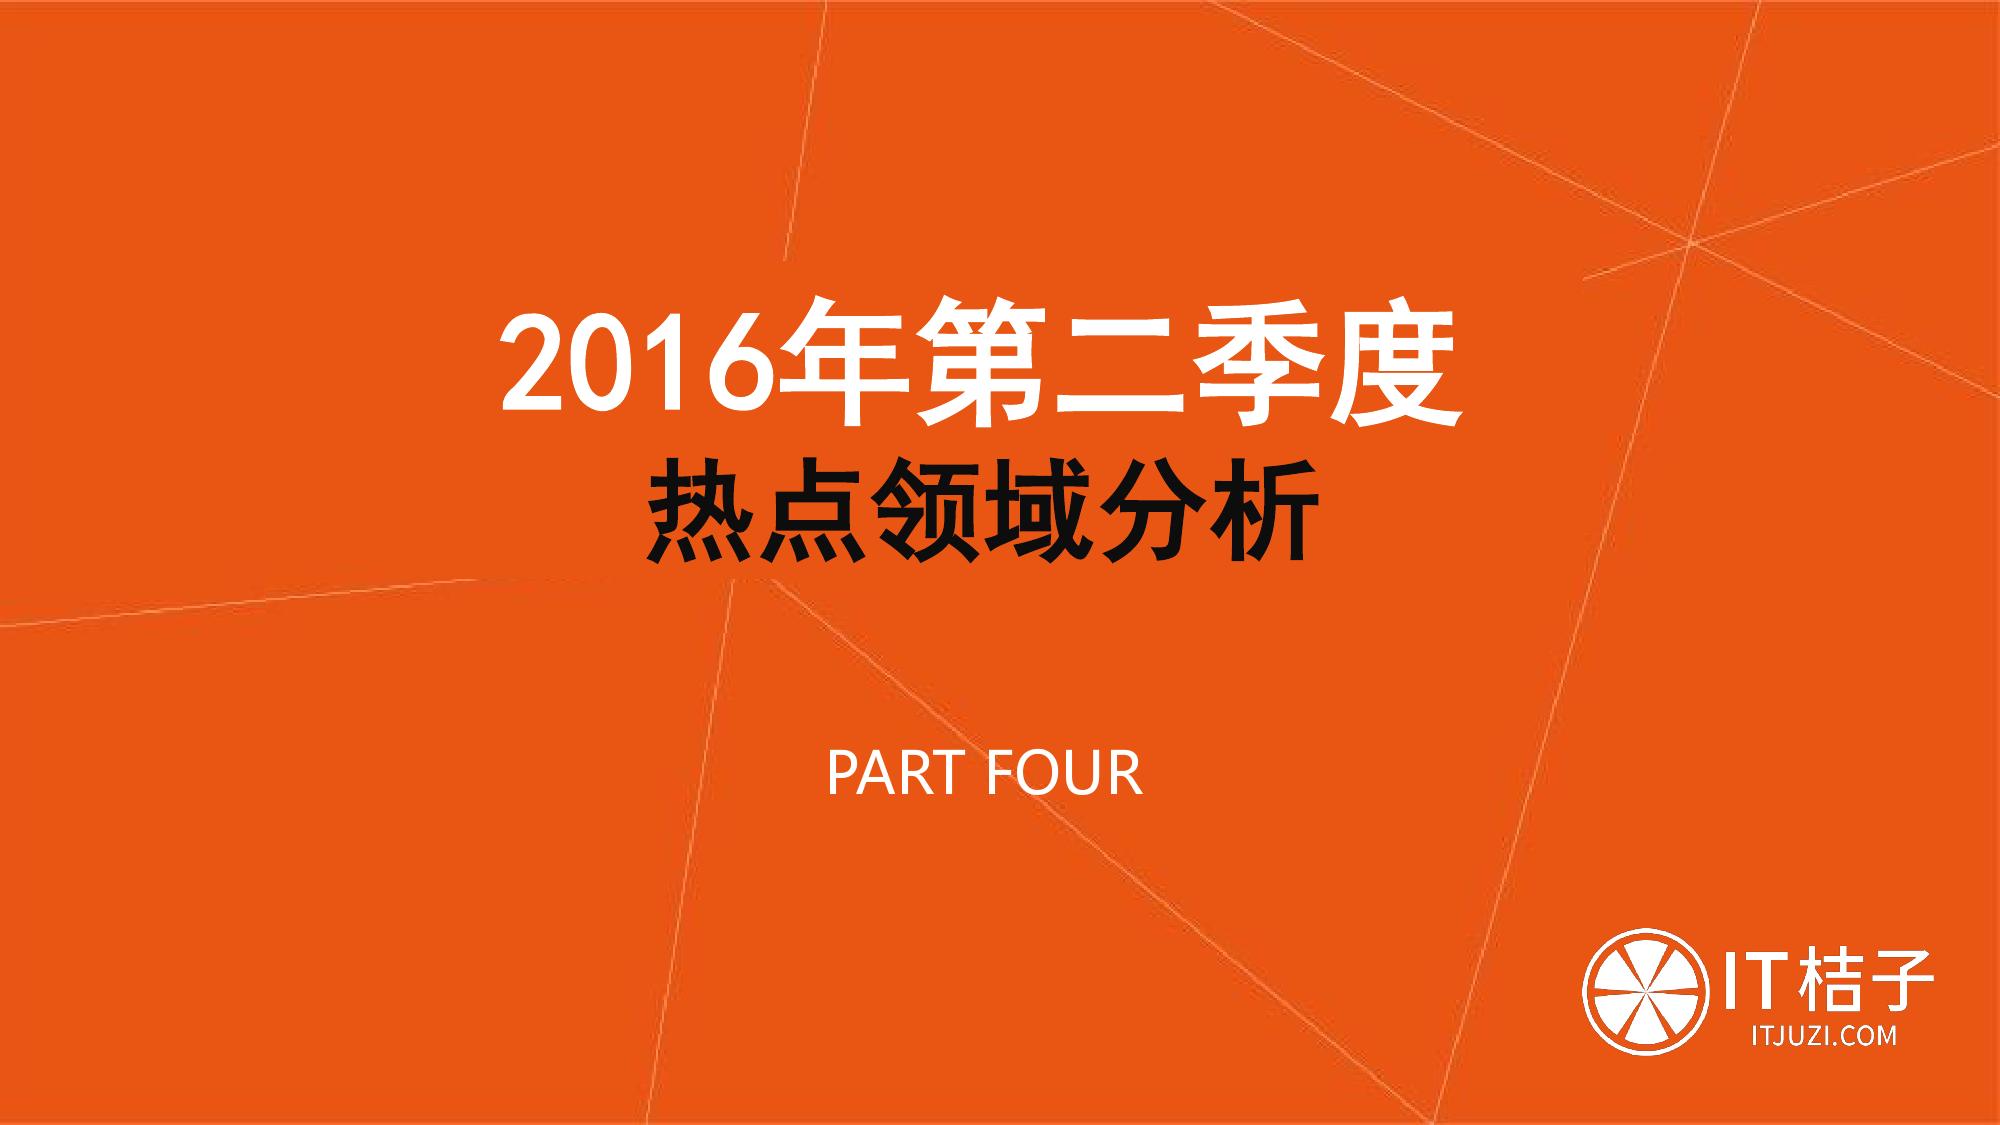 【IT桔子】2016年Q2中国互联网创业投资分析报告_000026